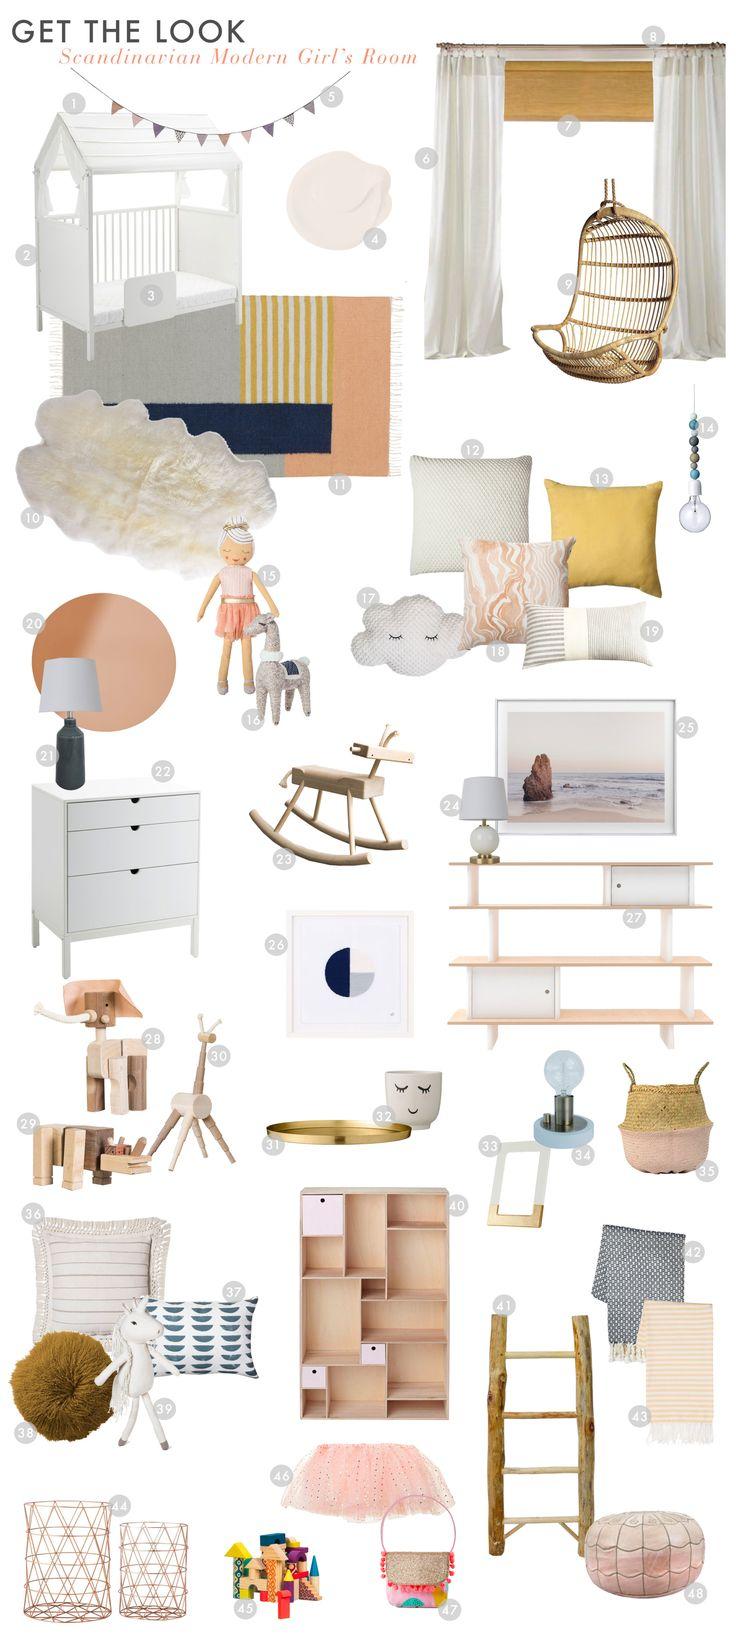 Want a Scandinavian Modern Little Girl's Bedroom? Here's a the perfect guide @stokkebaby @bradytolbert